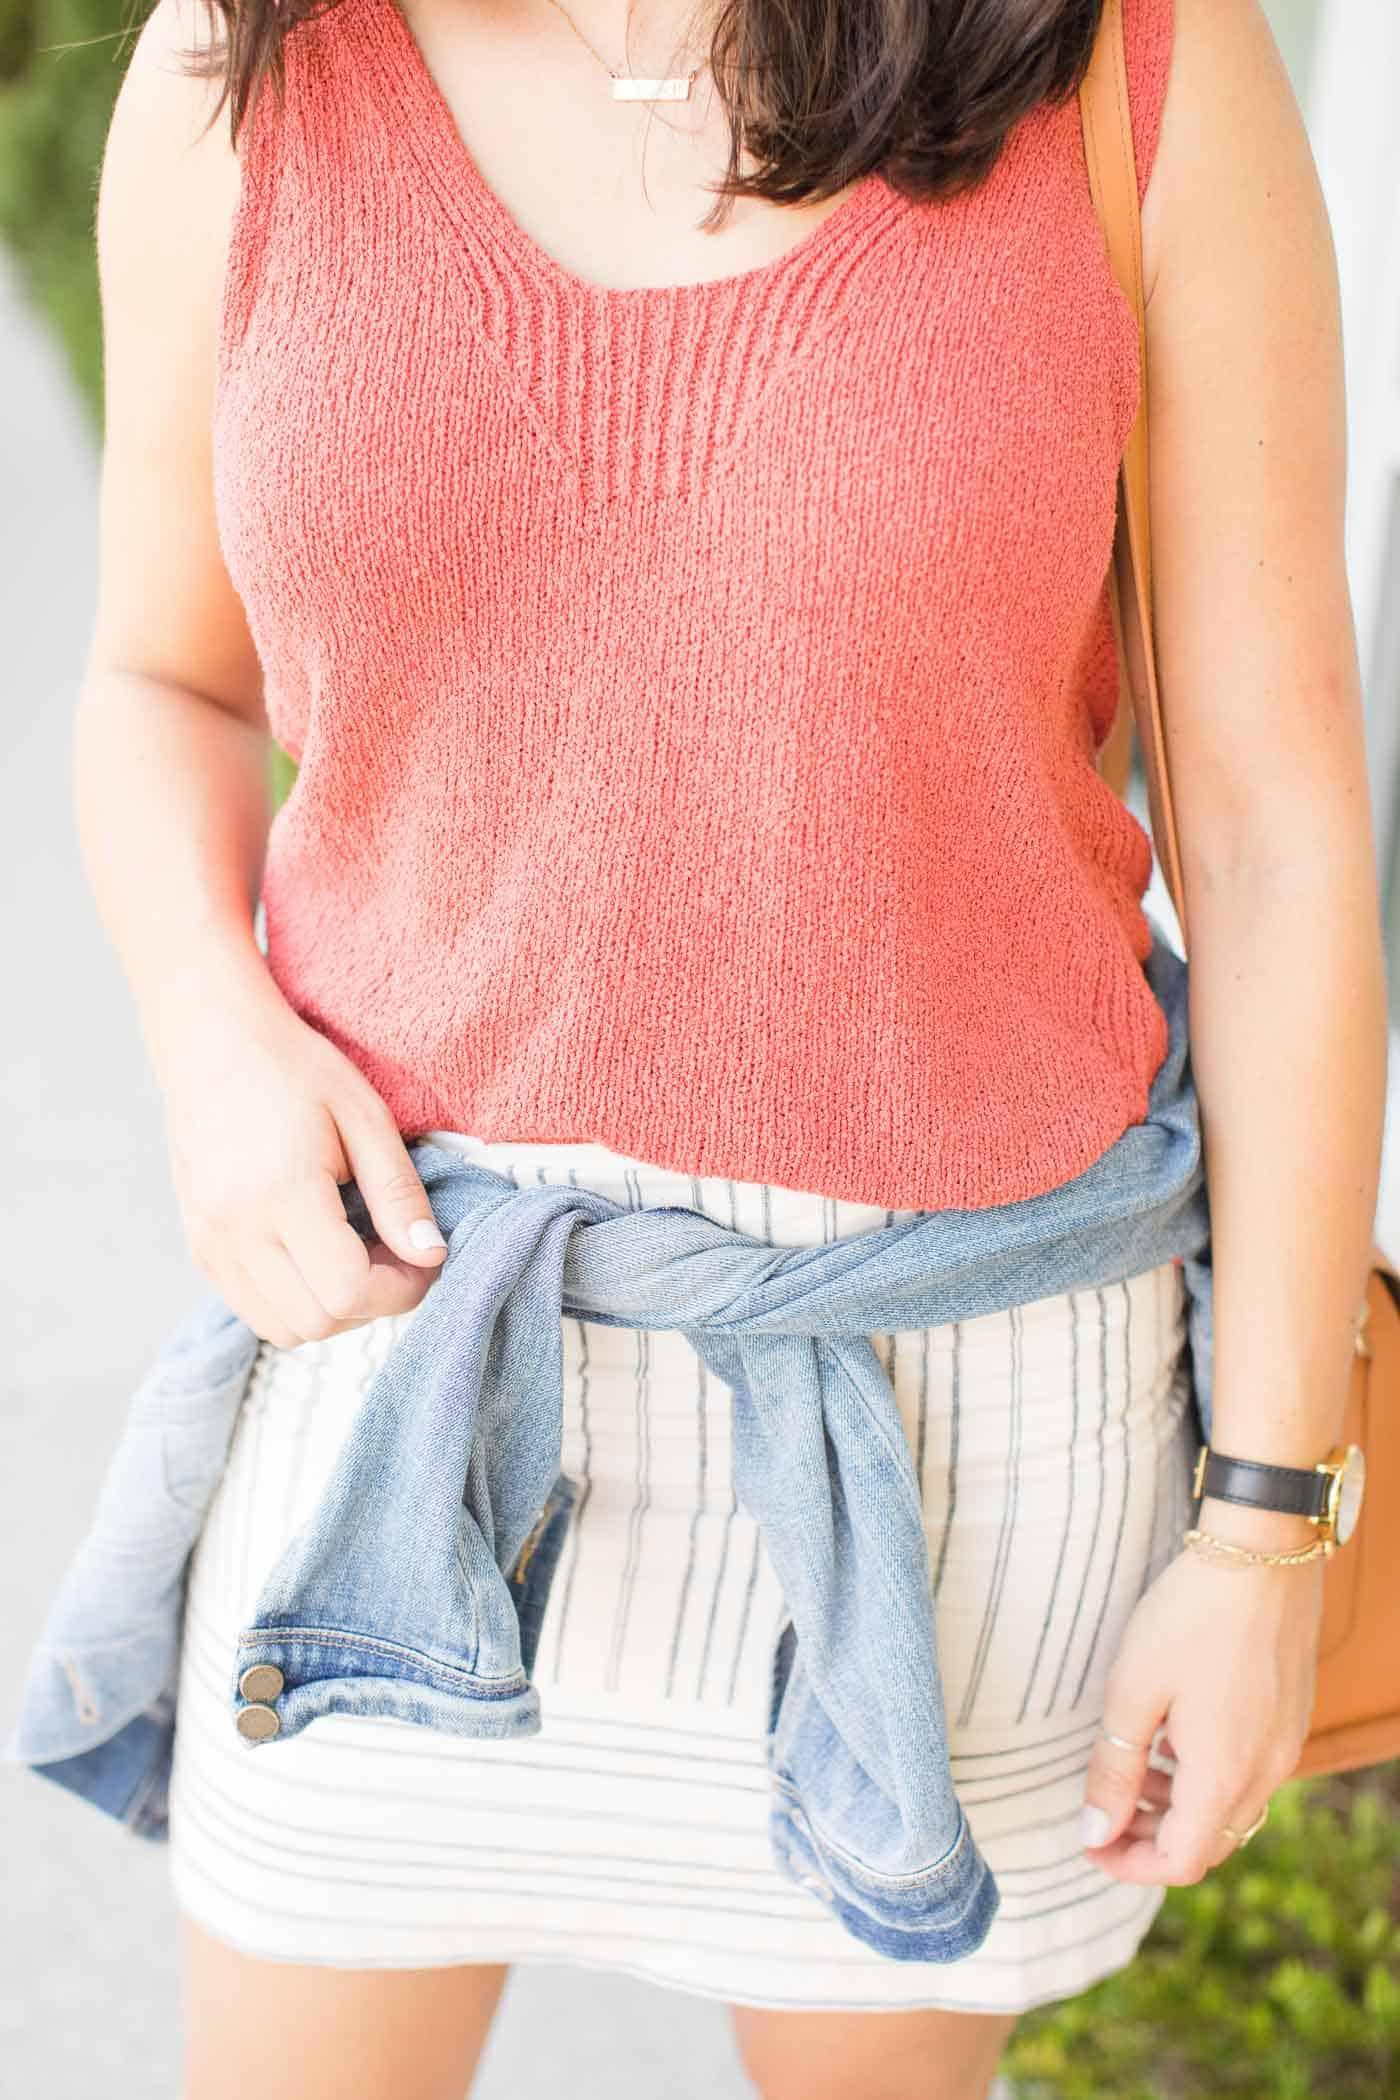 Mini skirt ideas, how to style a mini skirt for summer - My Style Vita @mystylevita